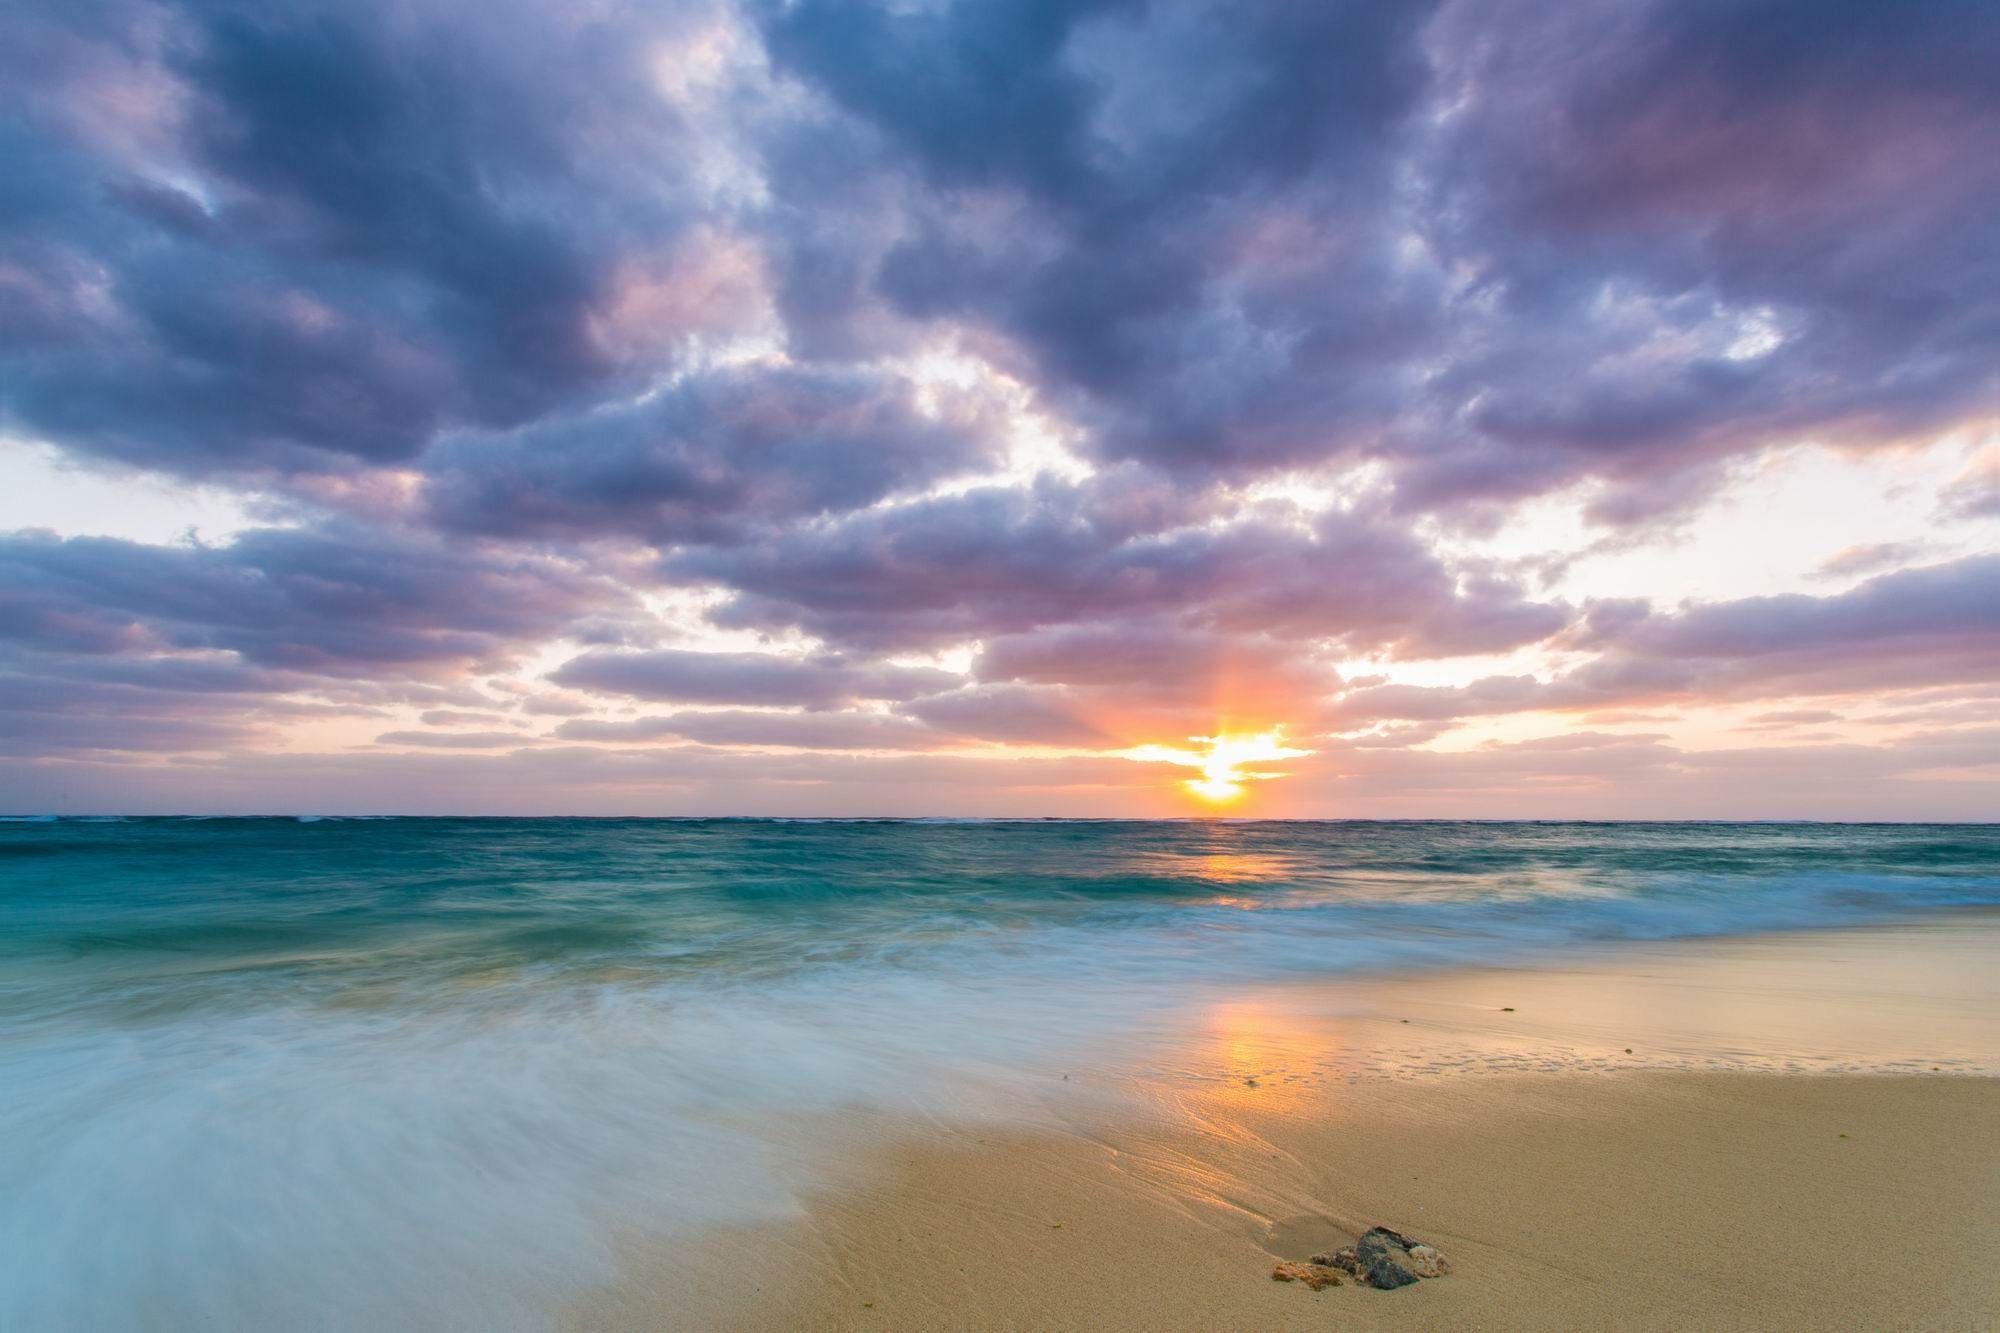 Beach 3 Elementem Photography Beach Painting Canvas Photography Beach